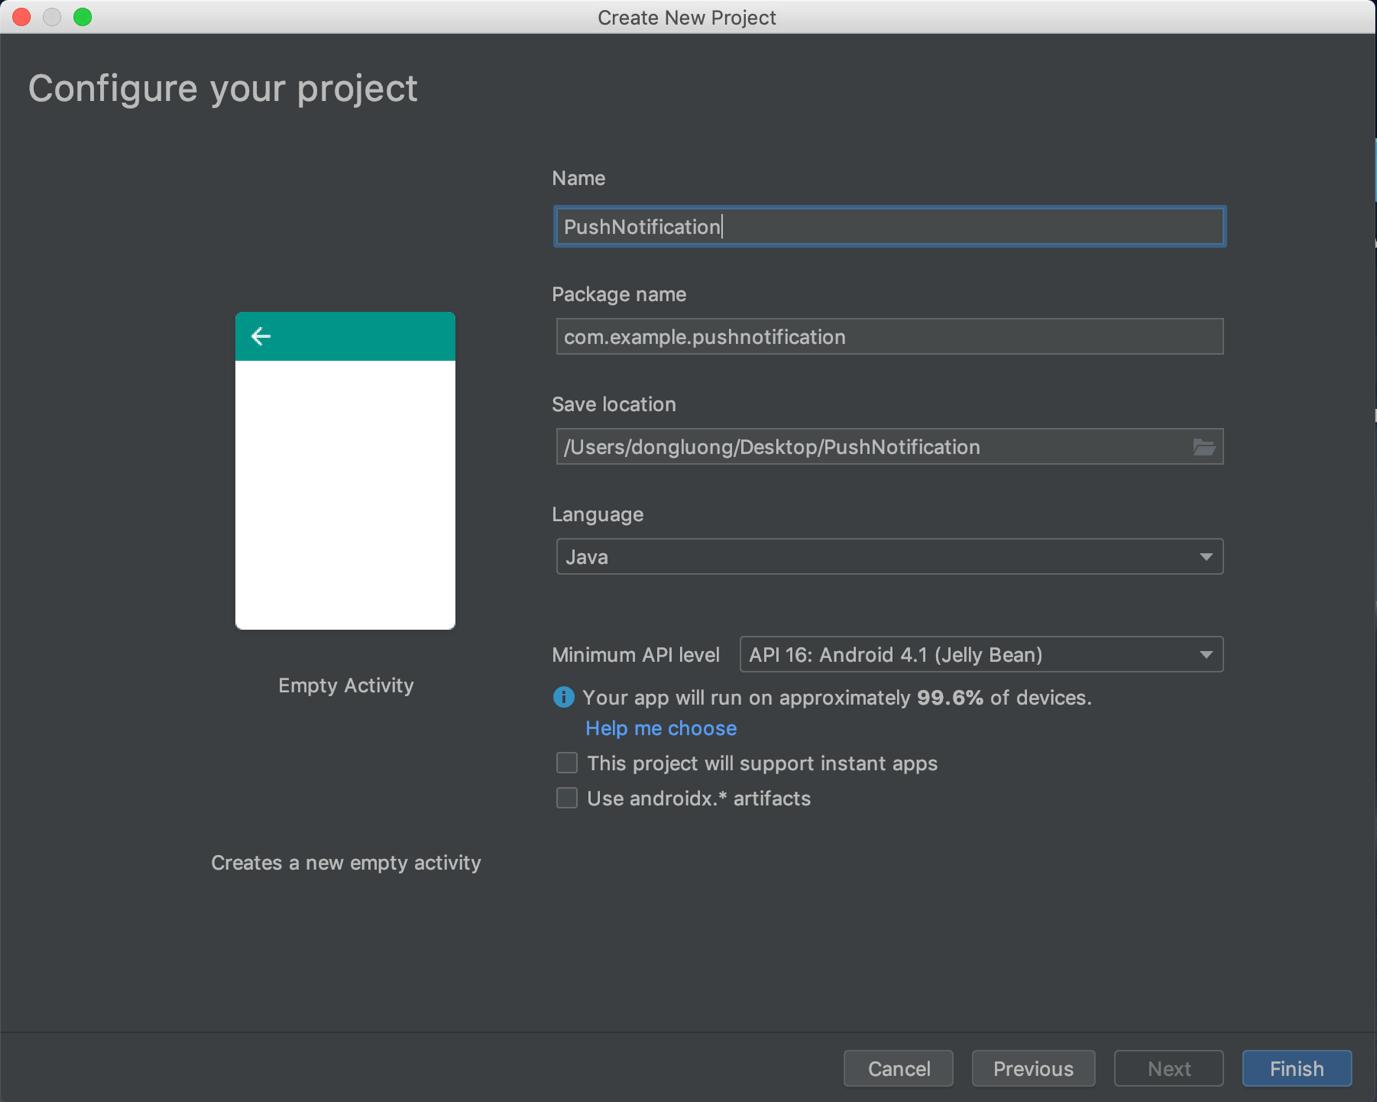 Tạo ứng dụng demo với Android Studio